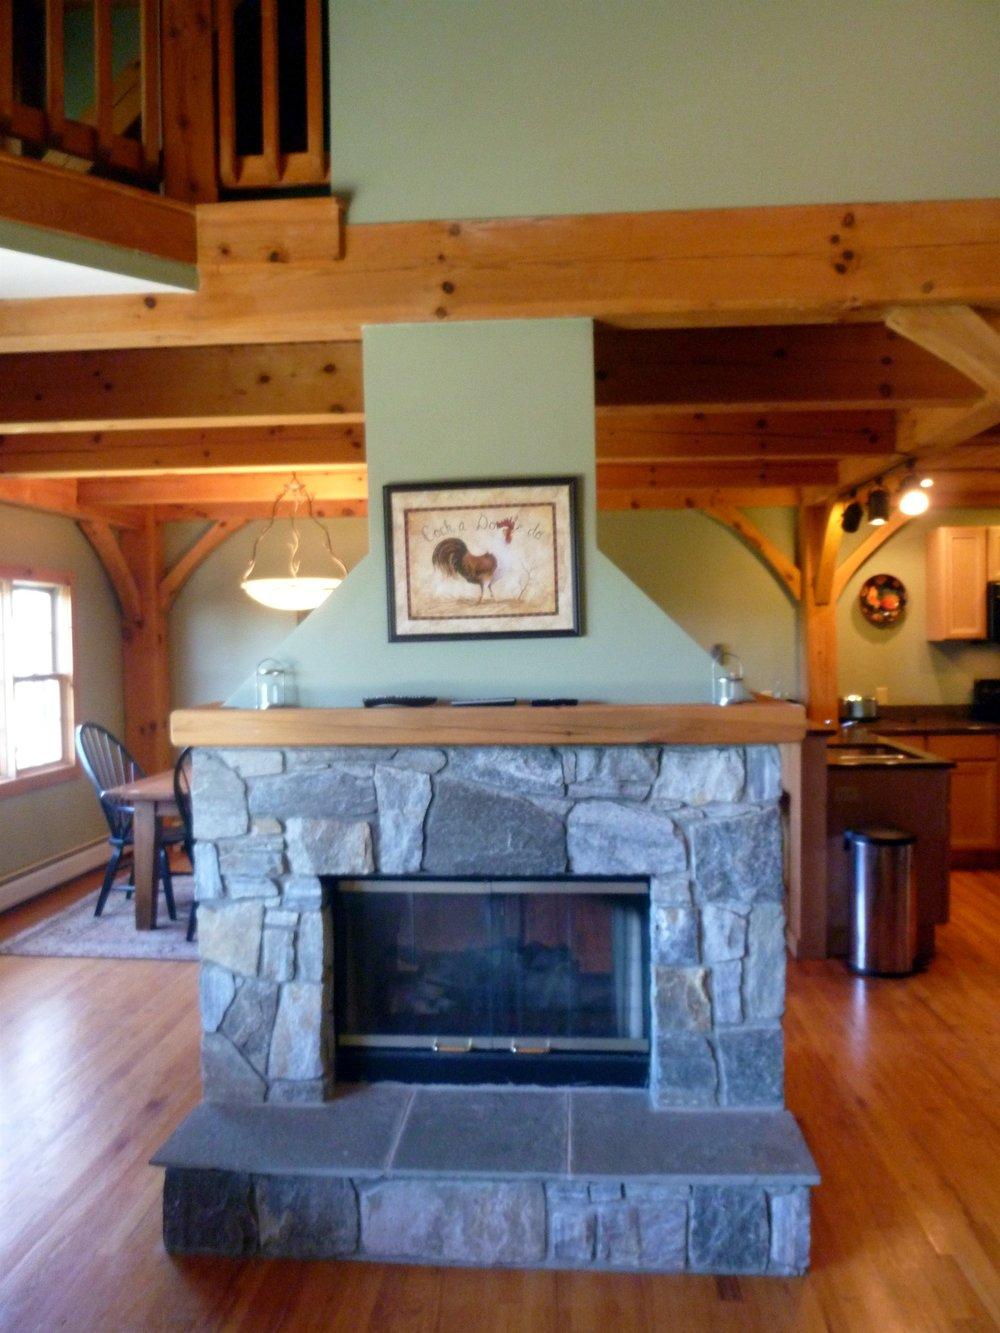 004_Fireplace.jpg